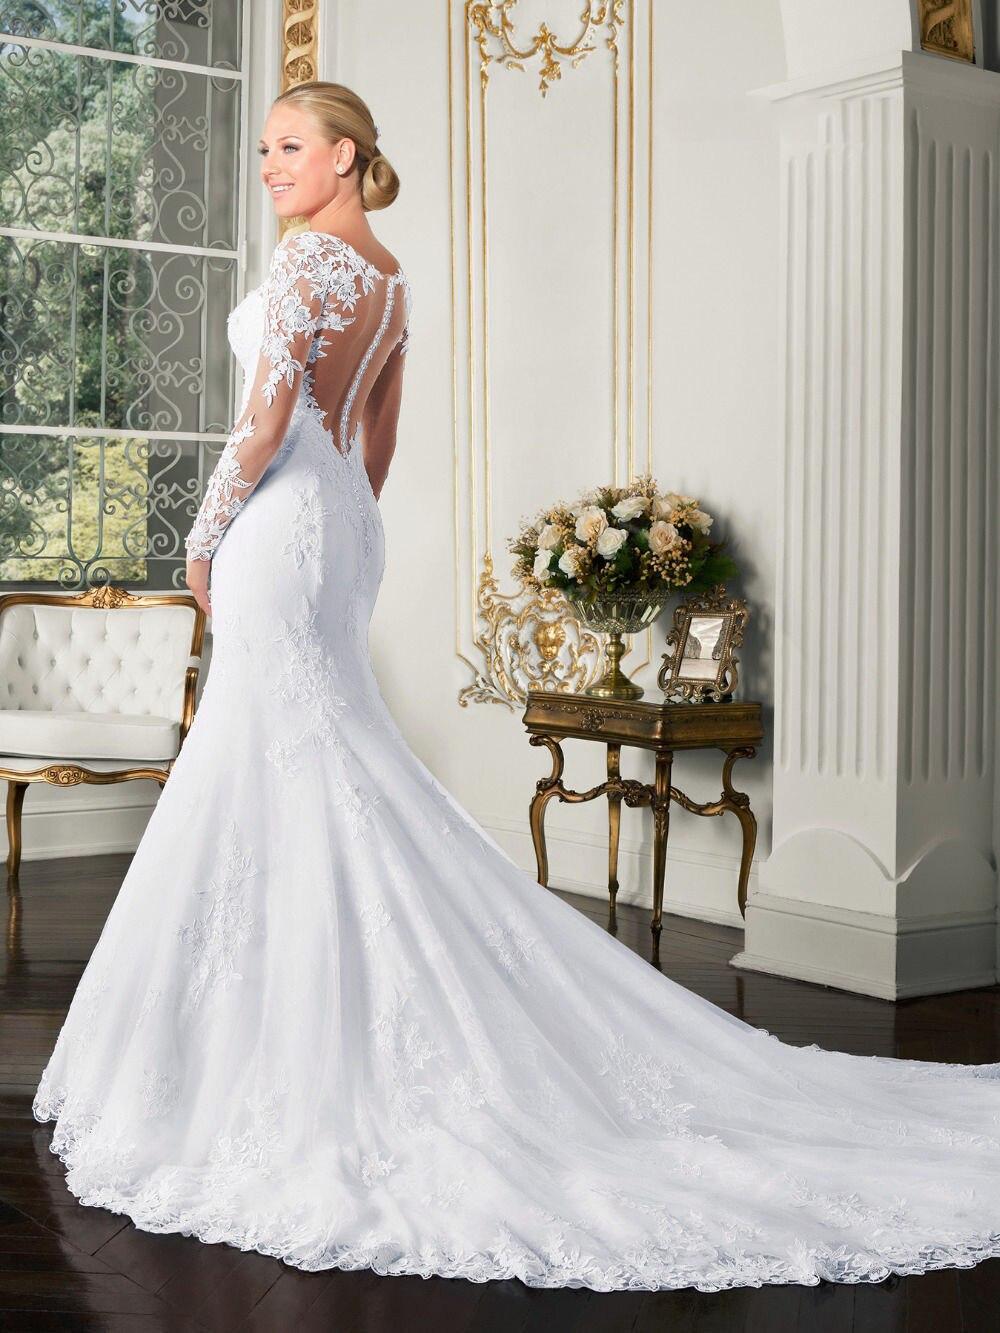 Beauty Emily Luxurious Embroidery Vestidos De Novia Long V Neck Lace Appliques Mermaid Wedding Dresses 19 Backless Bridal Gown 2